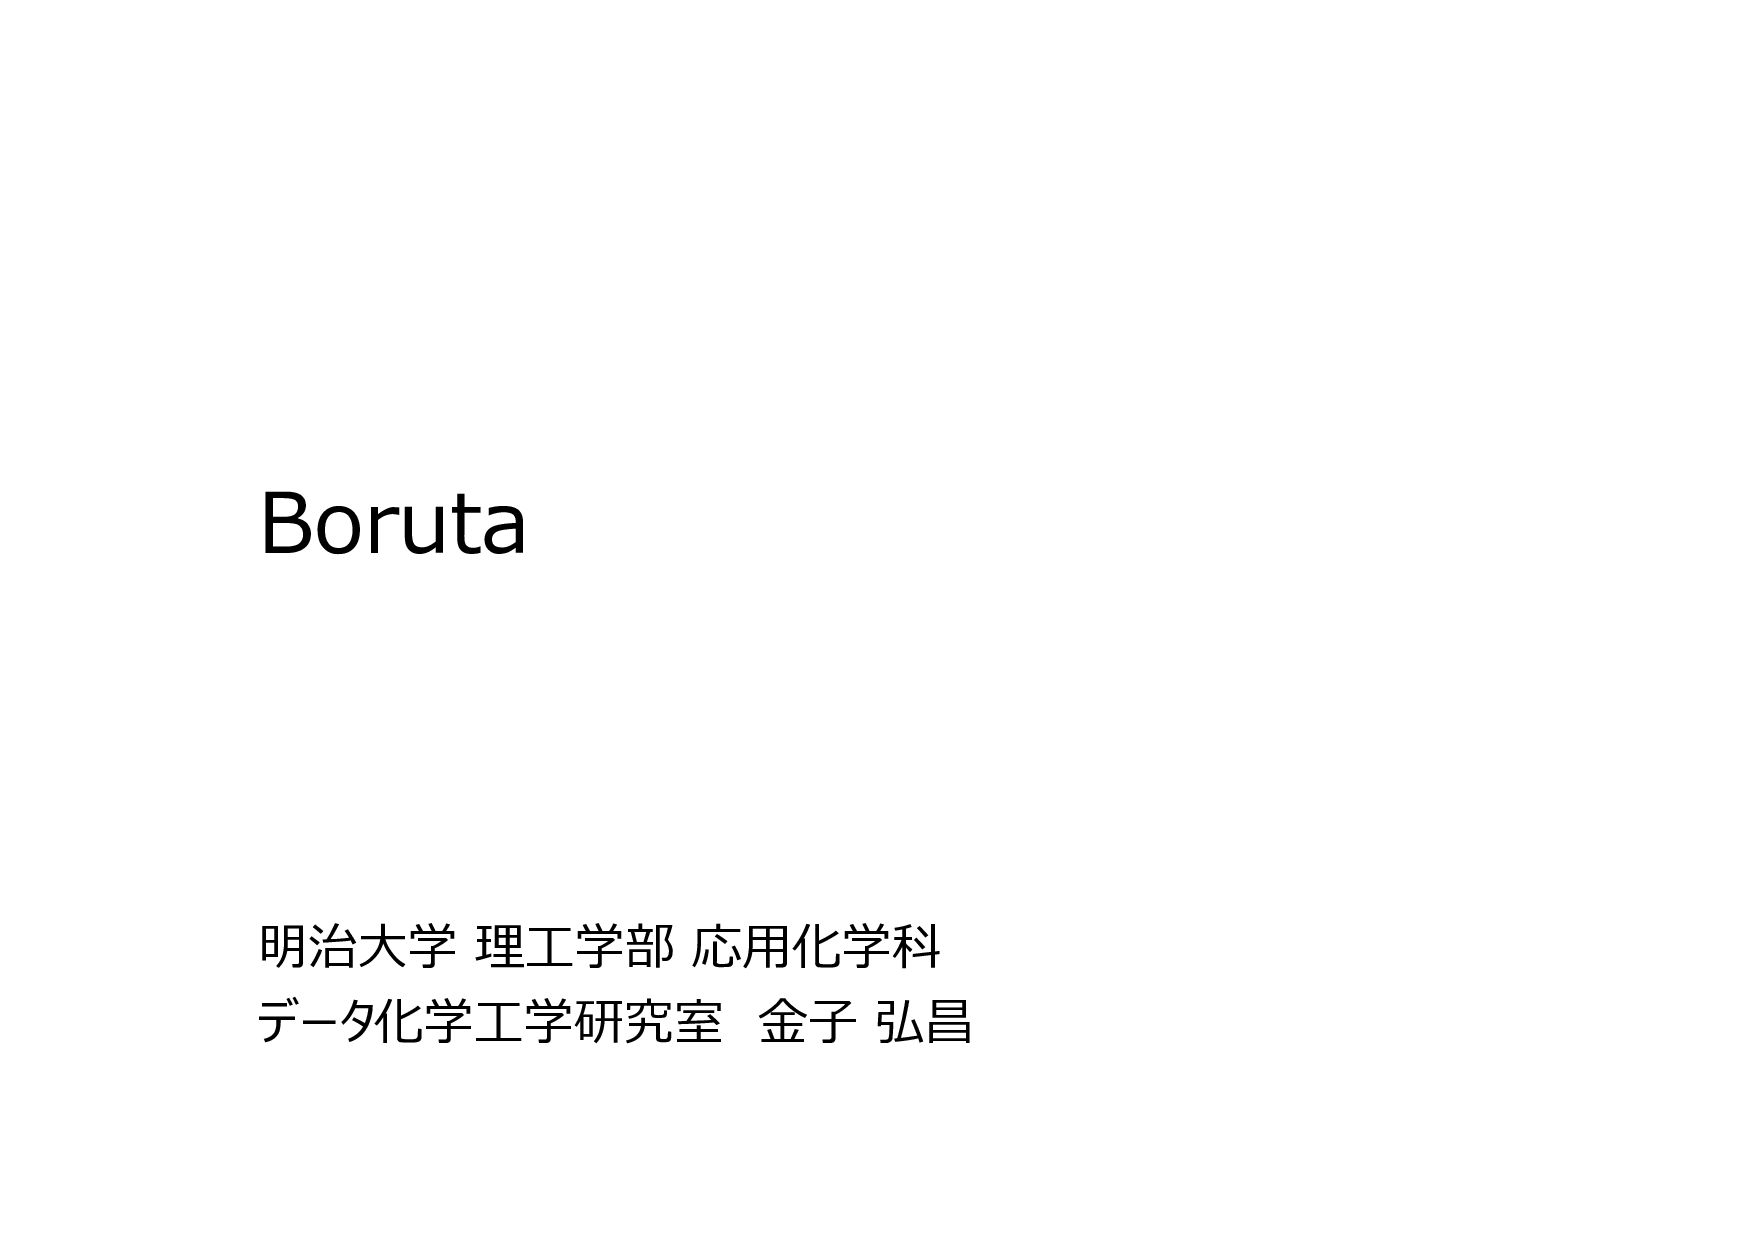 0 Boruta 明治大学 理⼯学部 応用化学科 データ化学⼯学研究室 ⾦⼦ 弘昌